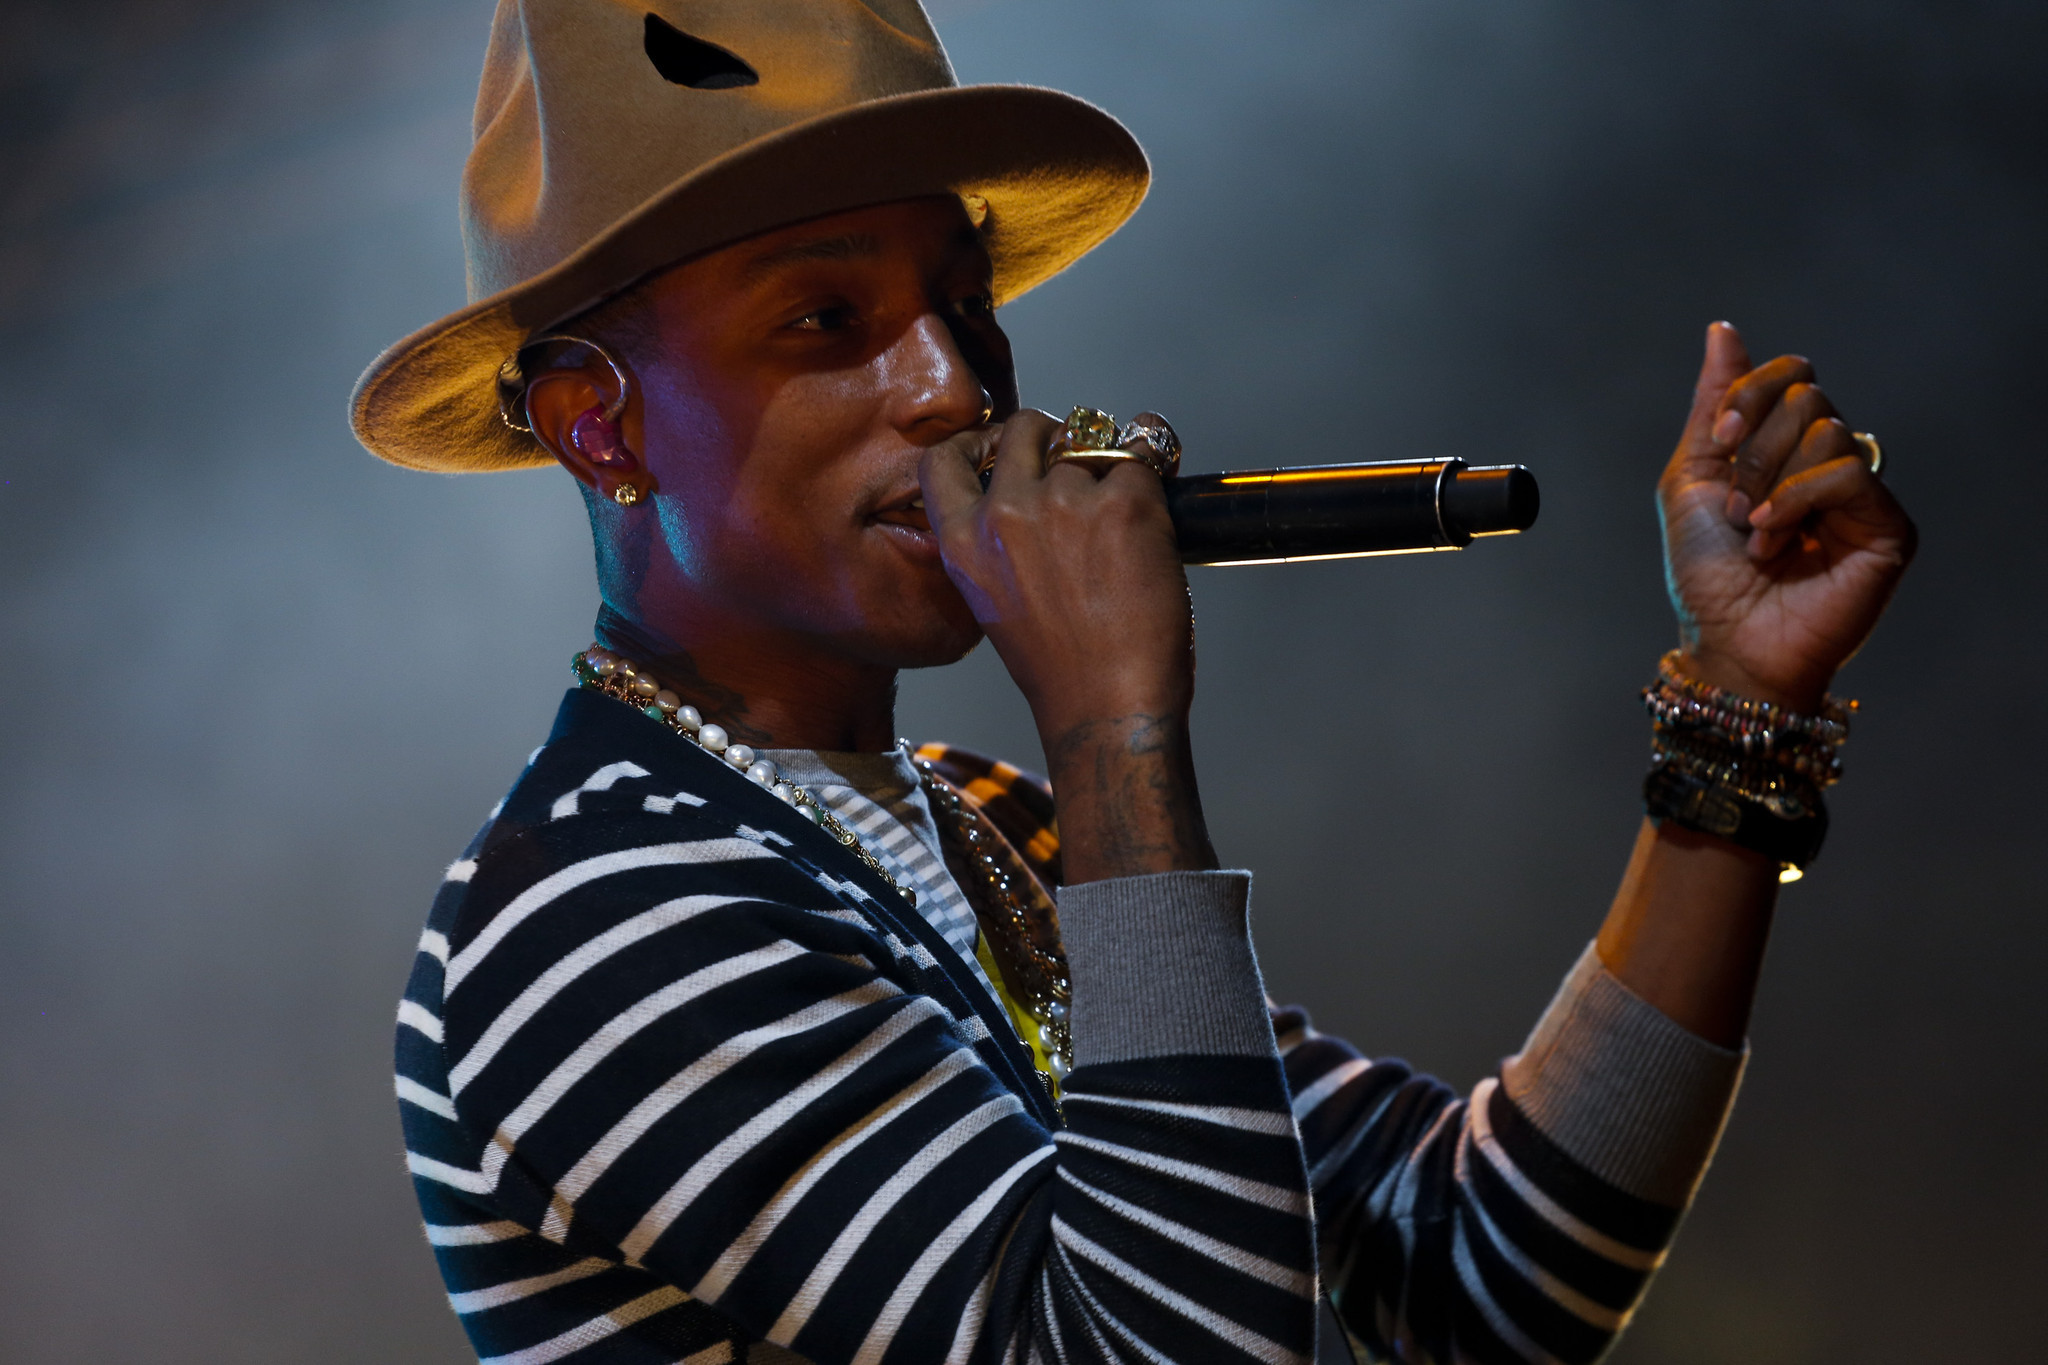 Pharrell Williams follows Rihanna as America's Fashion Icon